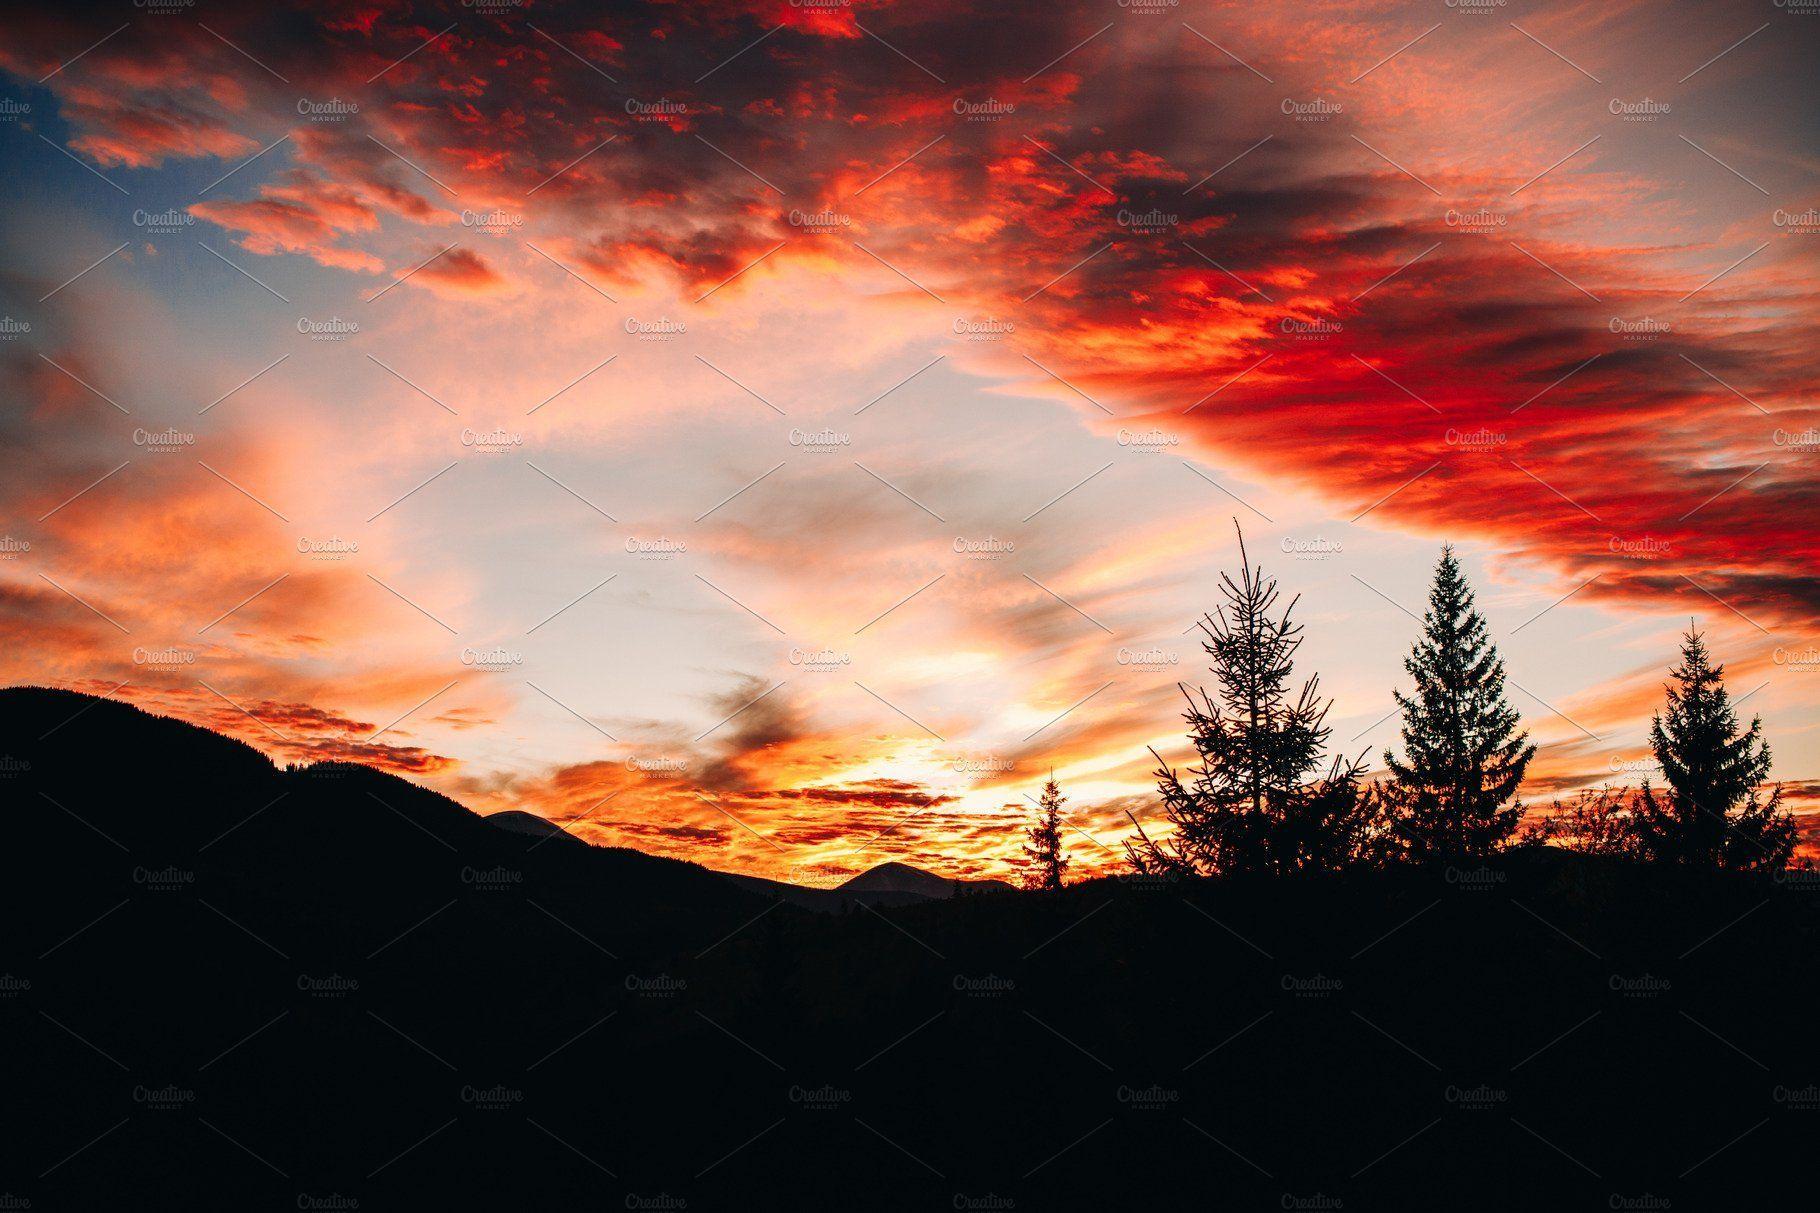 Beautiful Sunset In The Mountains Beautiful Sunset Landscape Scenery Mountain Paintings